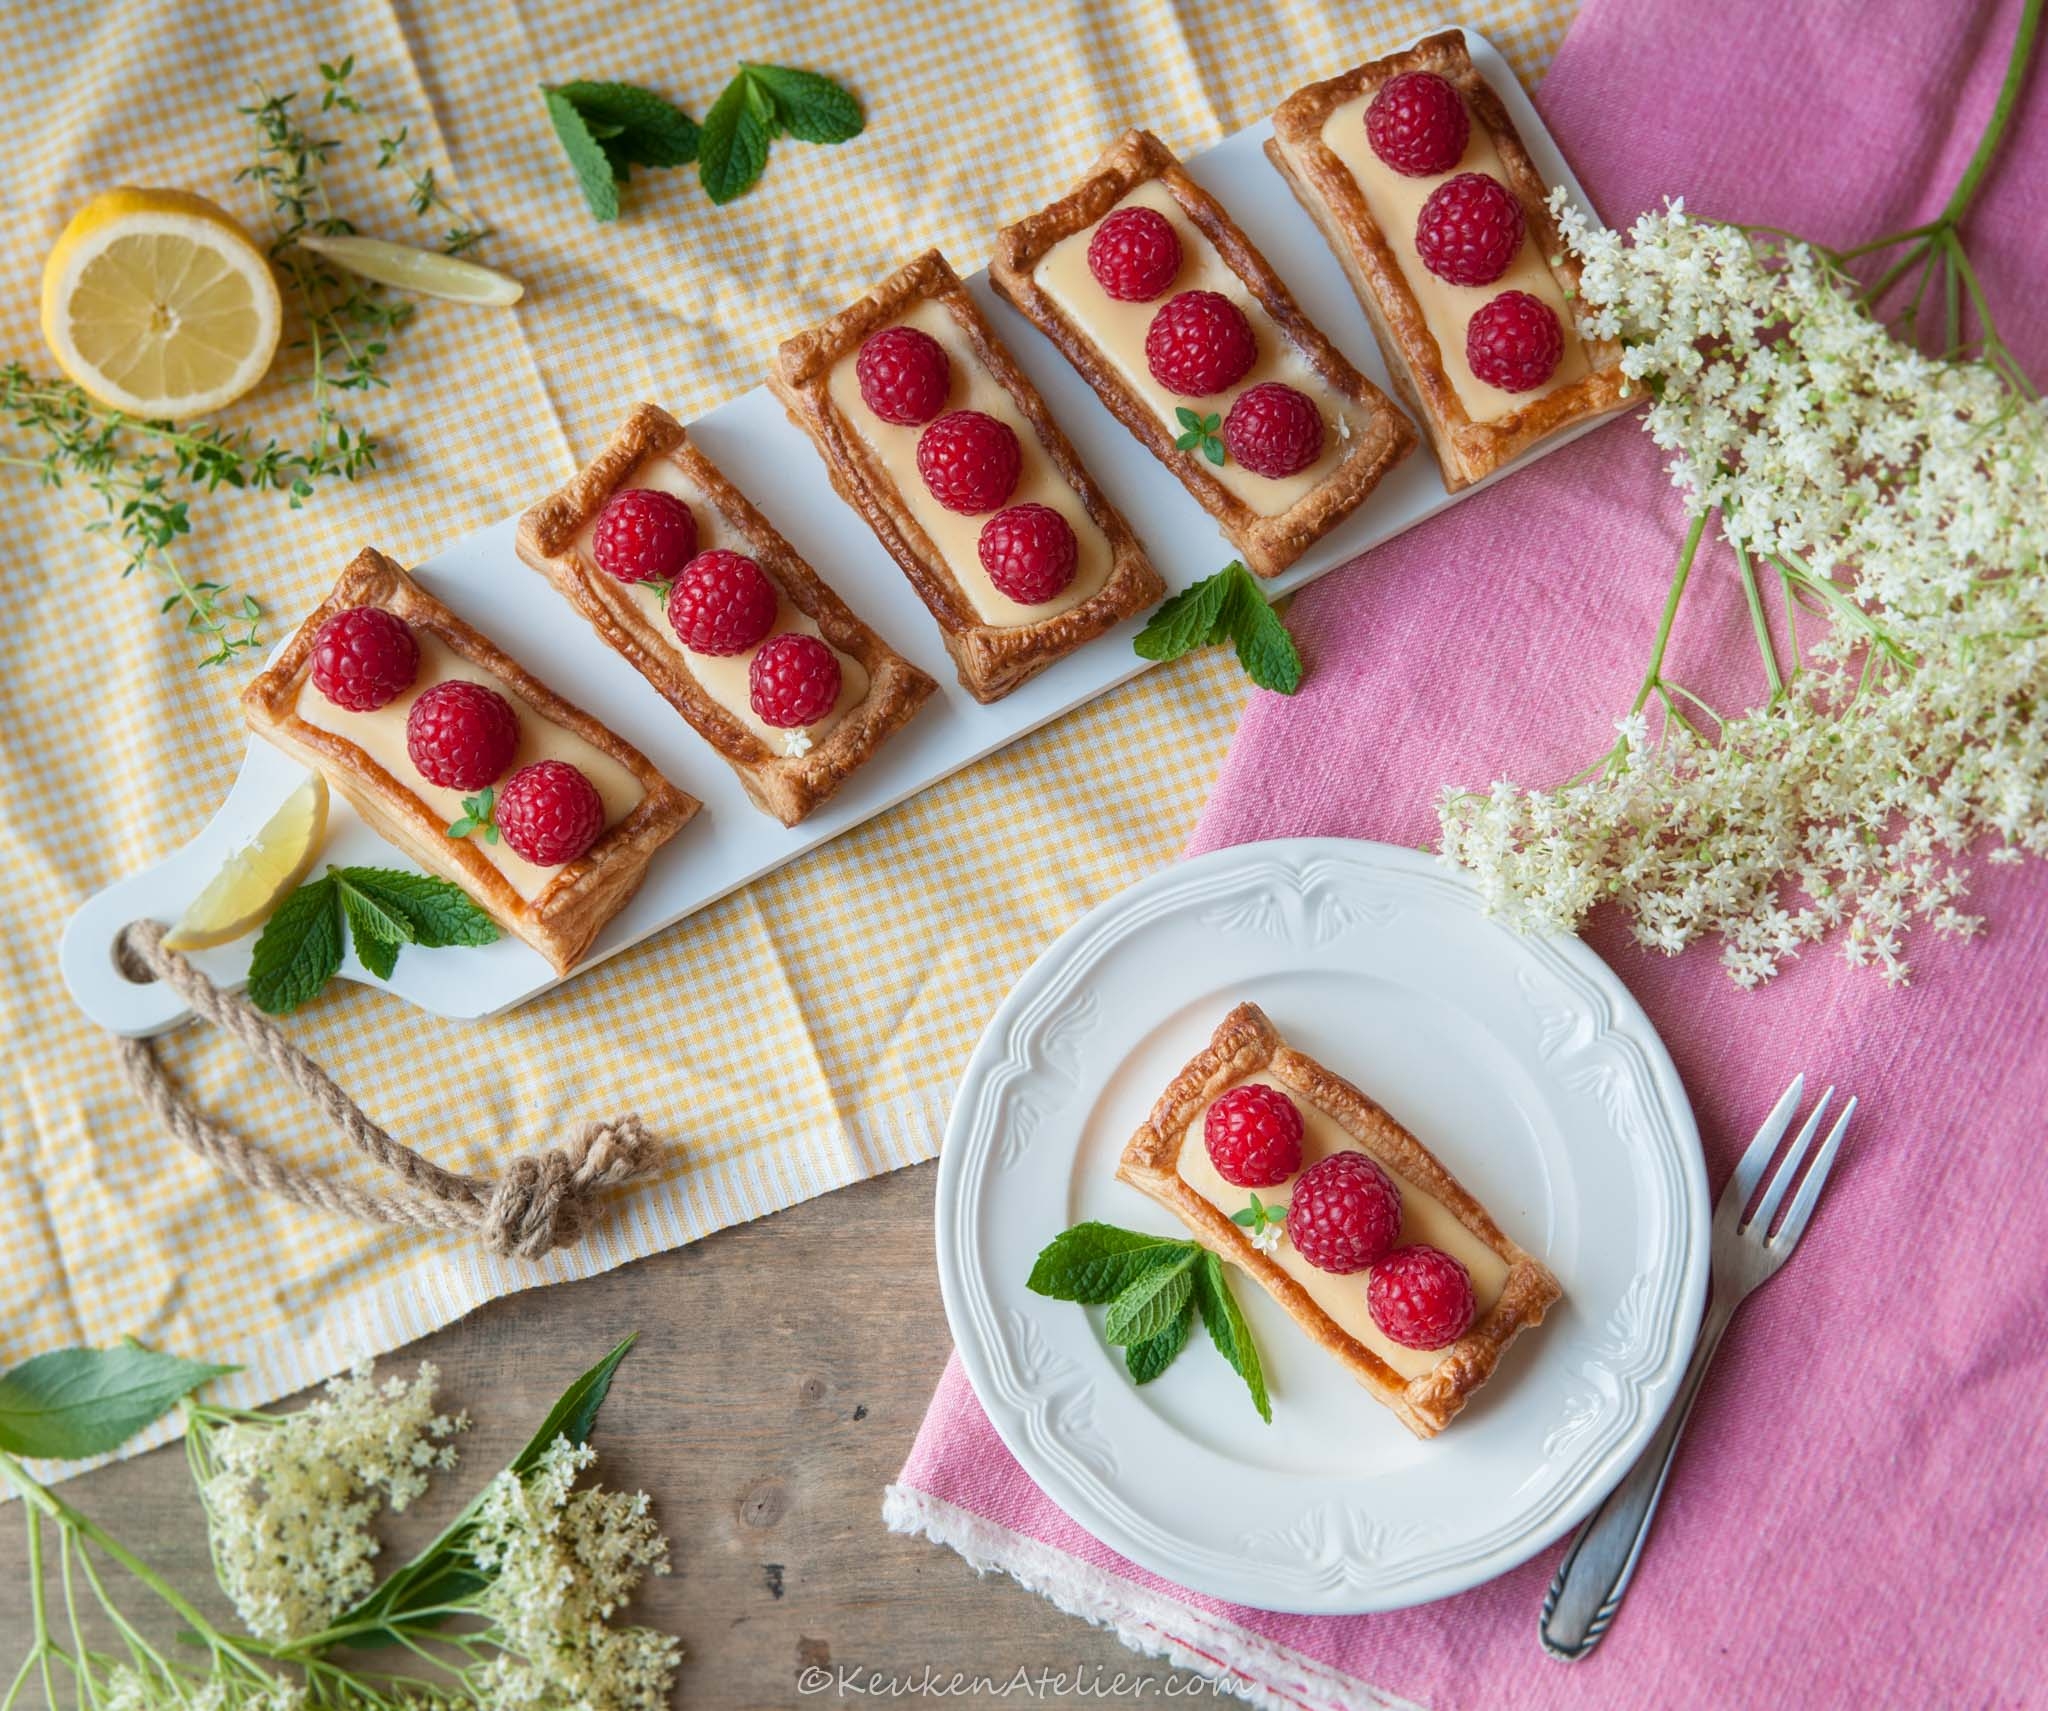 citroen frambozen taartjes 2 | KeukenAtelier.com